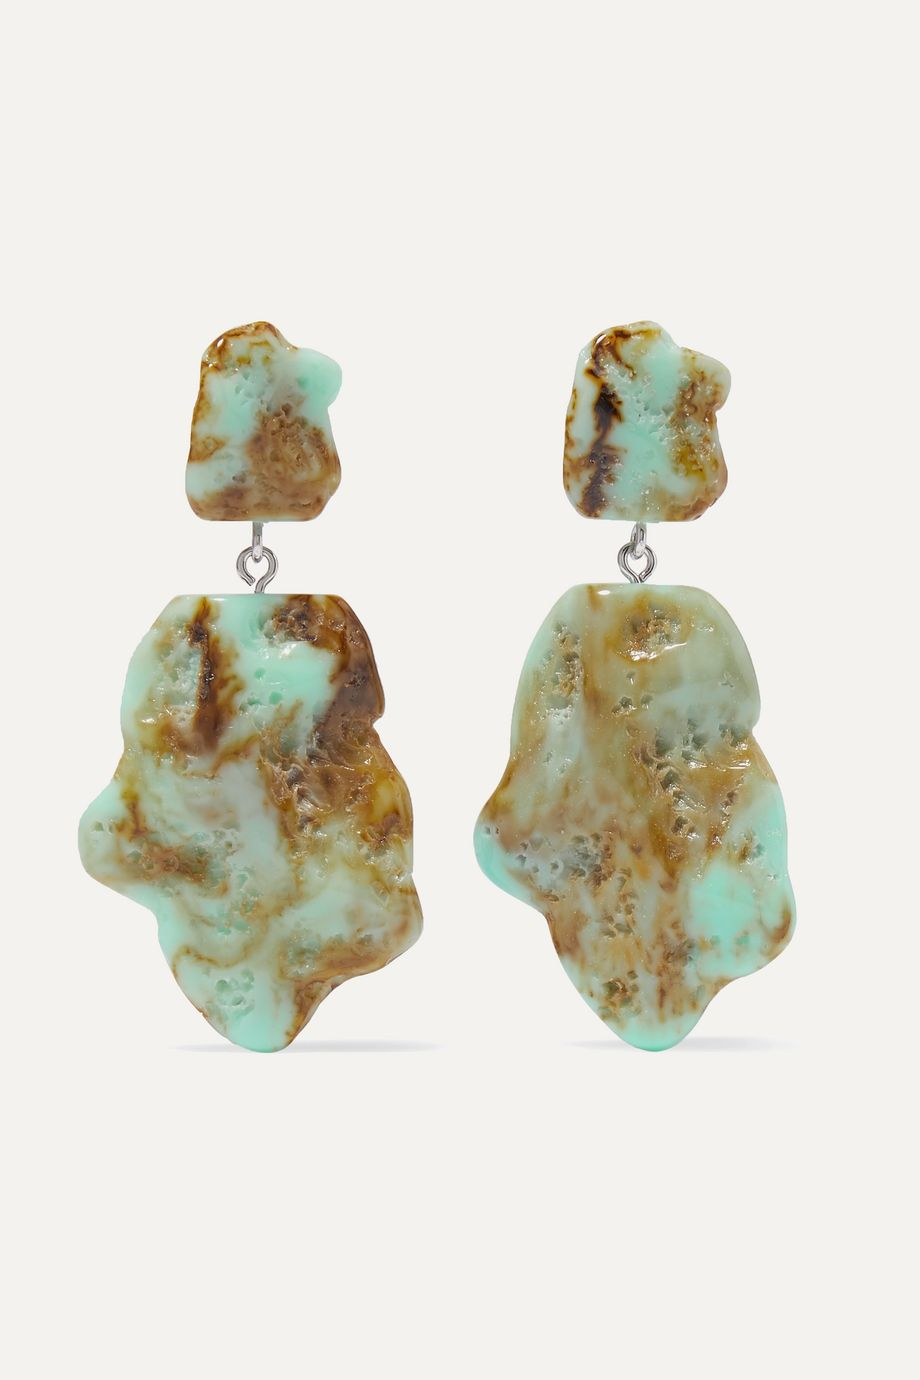 Valet Molly marbled resin earrings